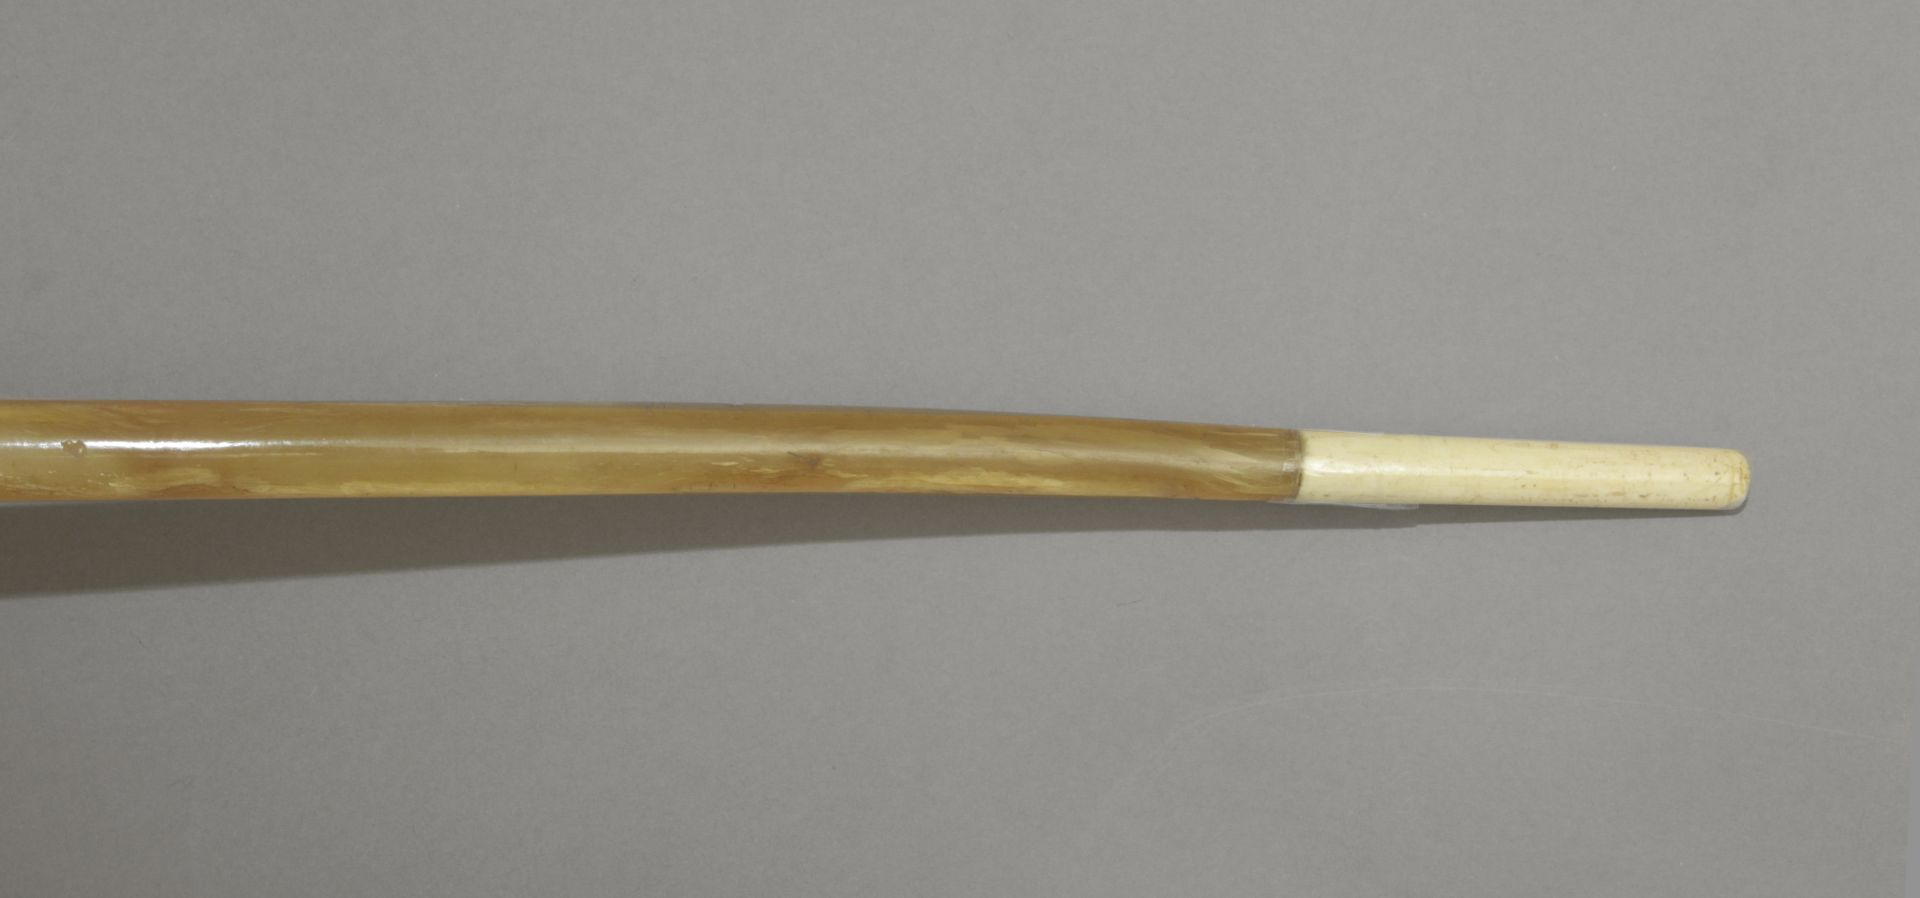 An ivory handled walking stick circa 1900 - Bild 3 aus 5